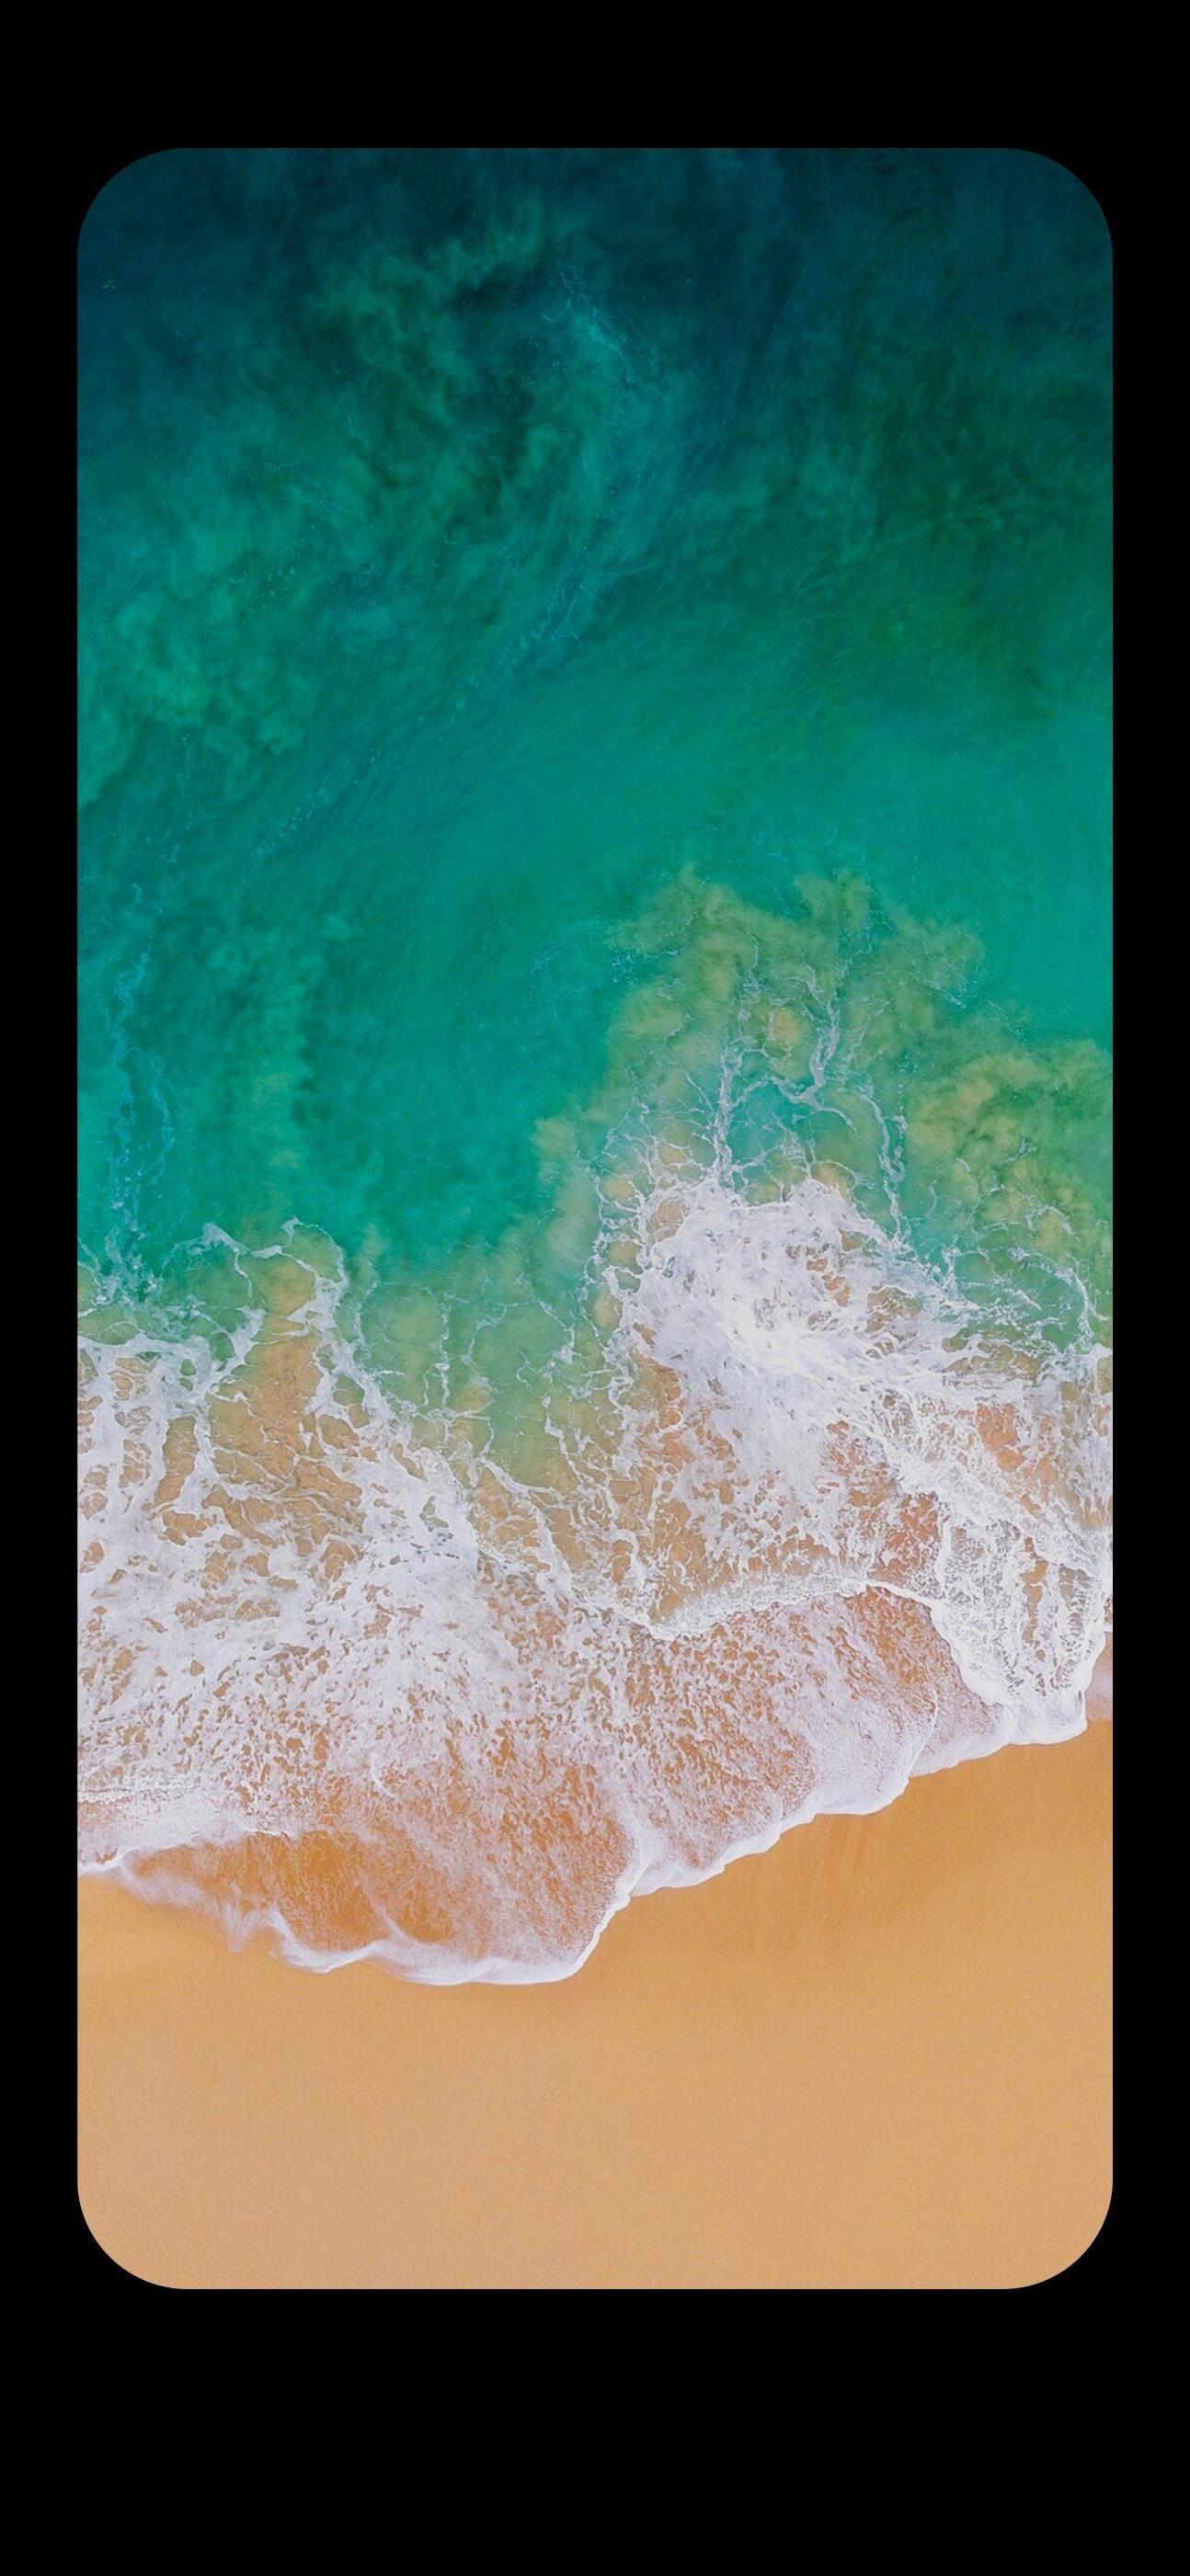 Custom Iphone X Wallpaper 28 Images Apple Iphone X Stock